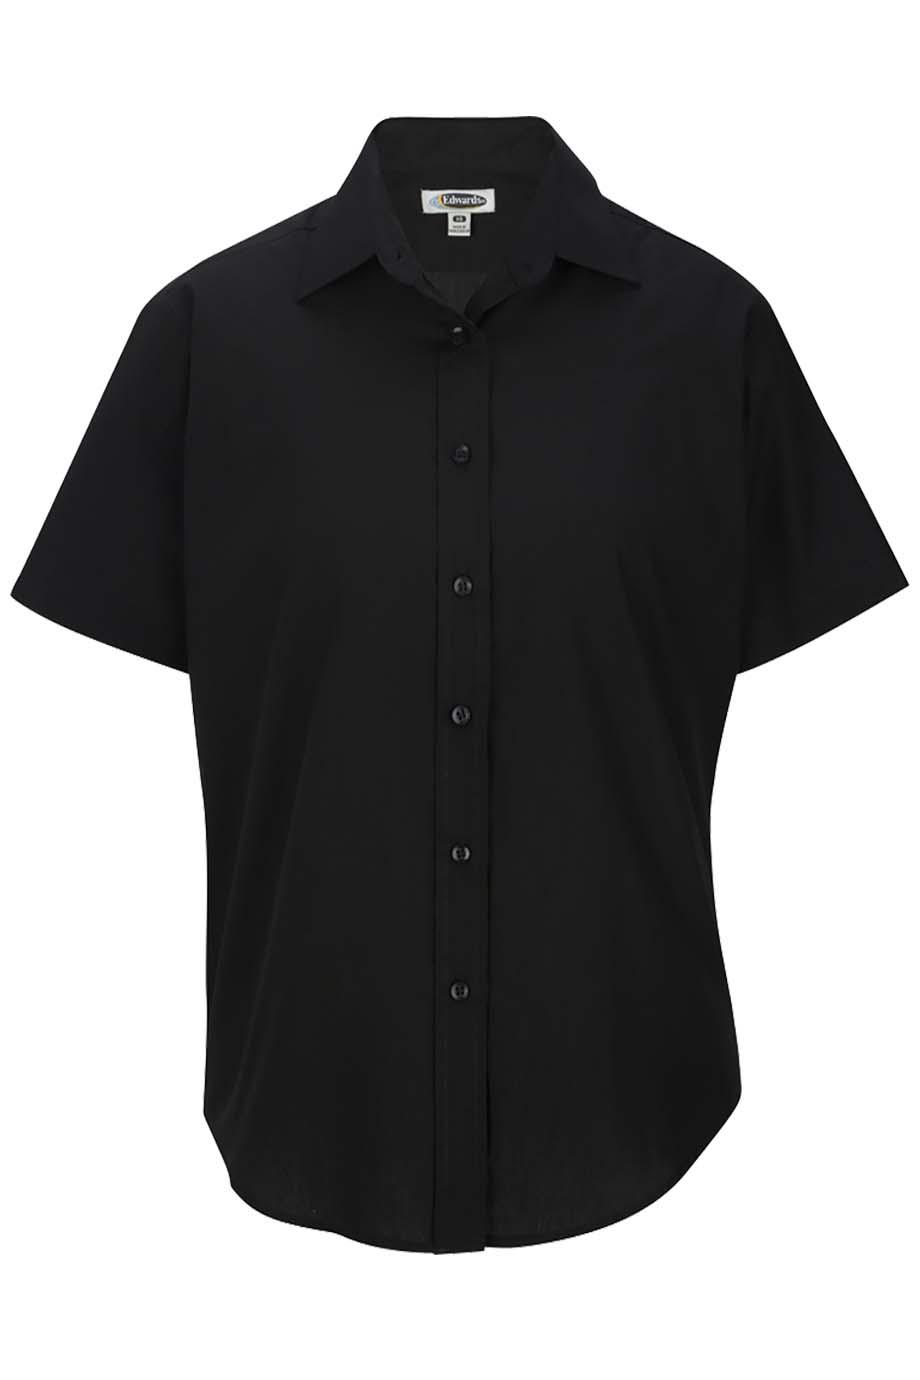 6e32a96d Buy Edwards Ladies Short Sleeve Value Broadcloth Shirt - Edwards ...